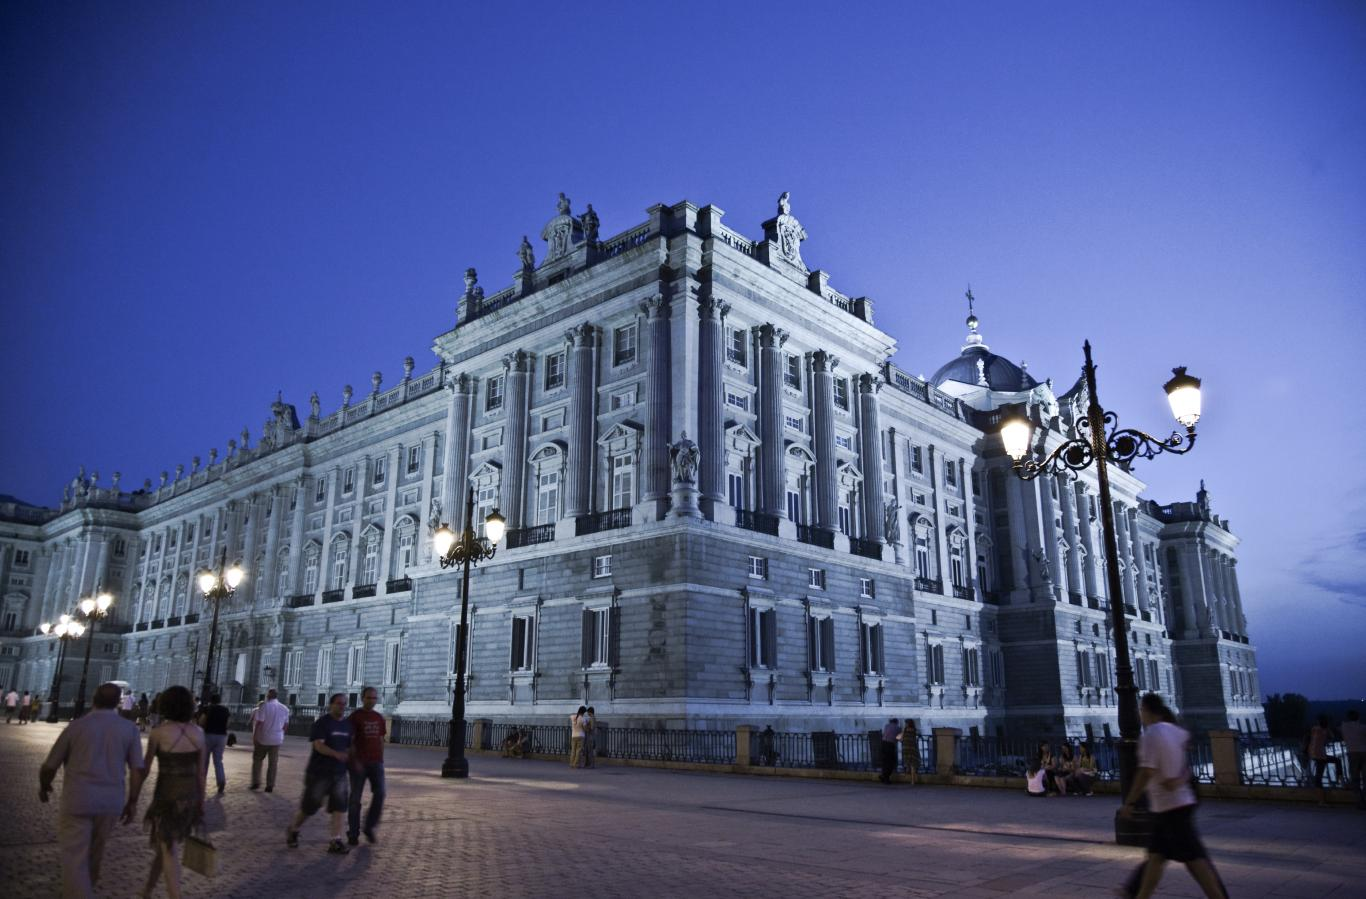 Anochecer en Palacio